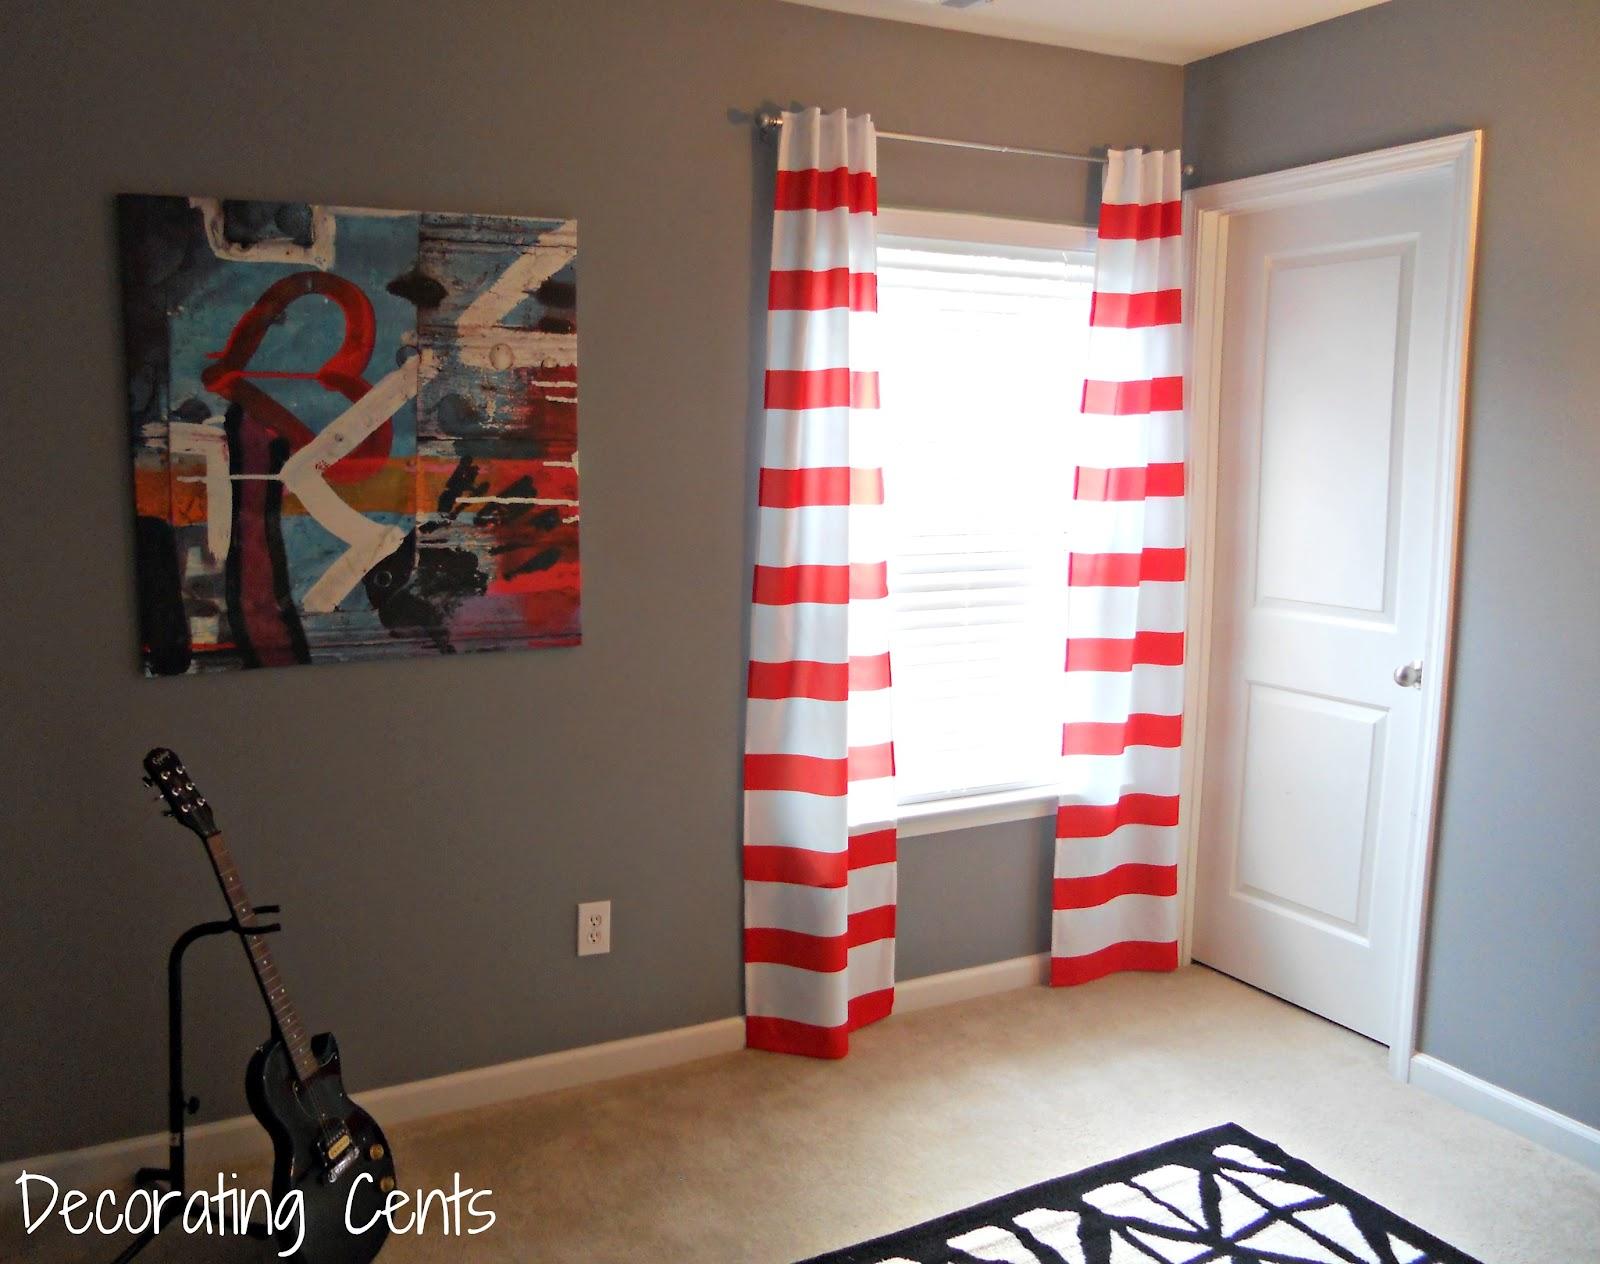 Awesome Hgtv Decorating Cents Photos - Decorating Interior Design ...